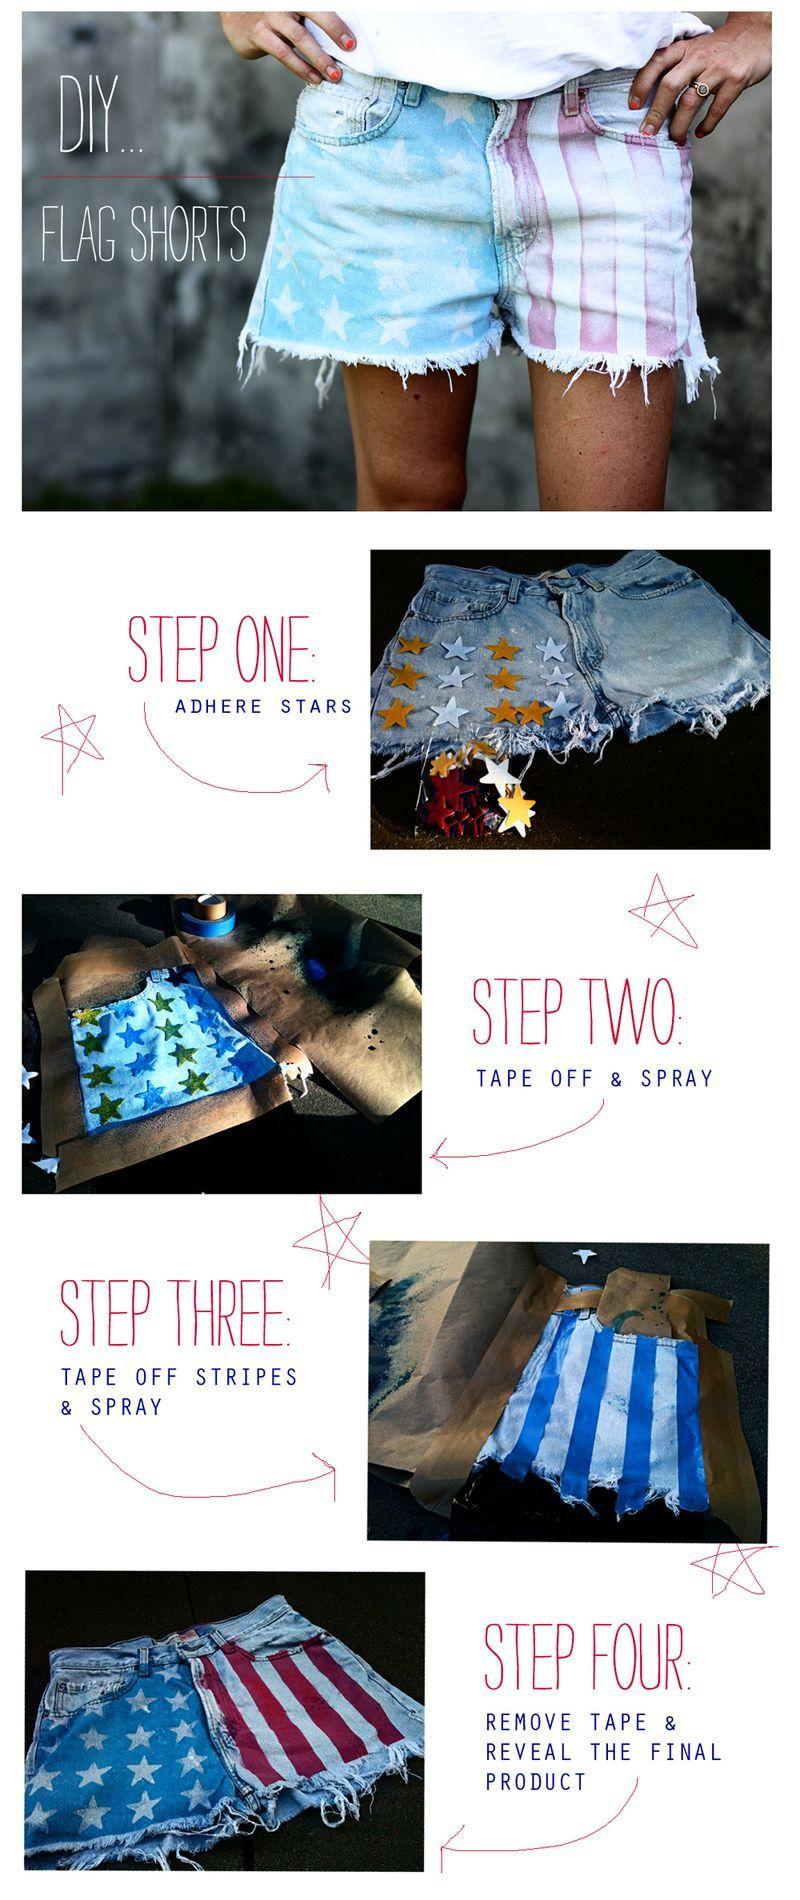 DIY... [american flag shorts]